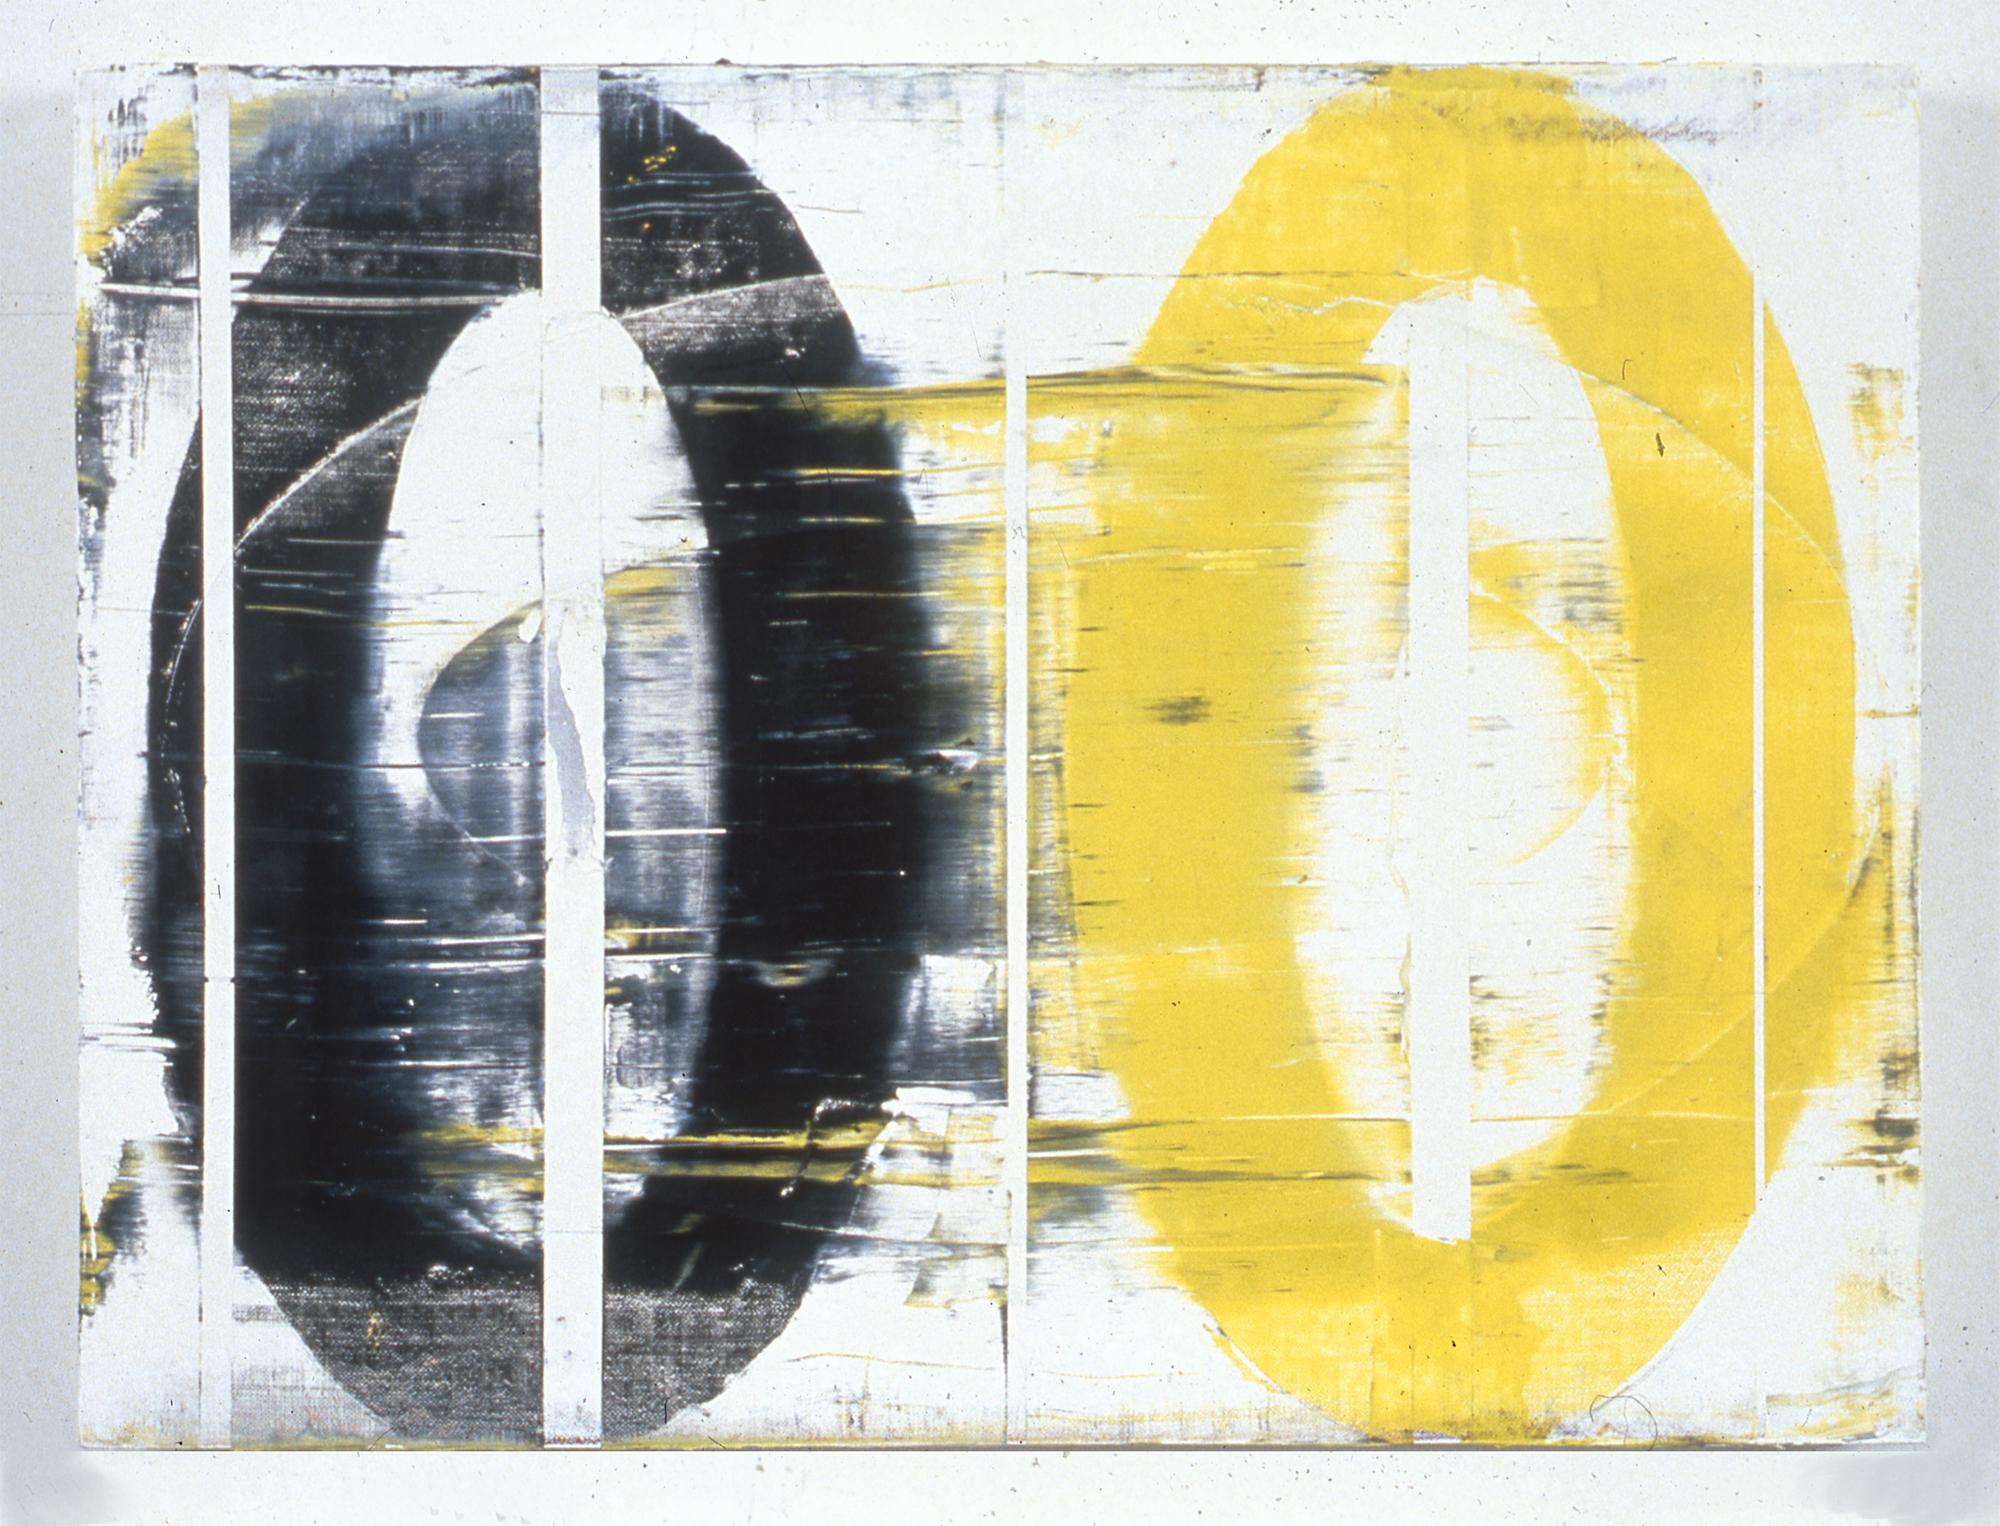 David Row - Double Aught VII